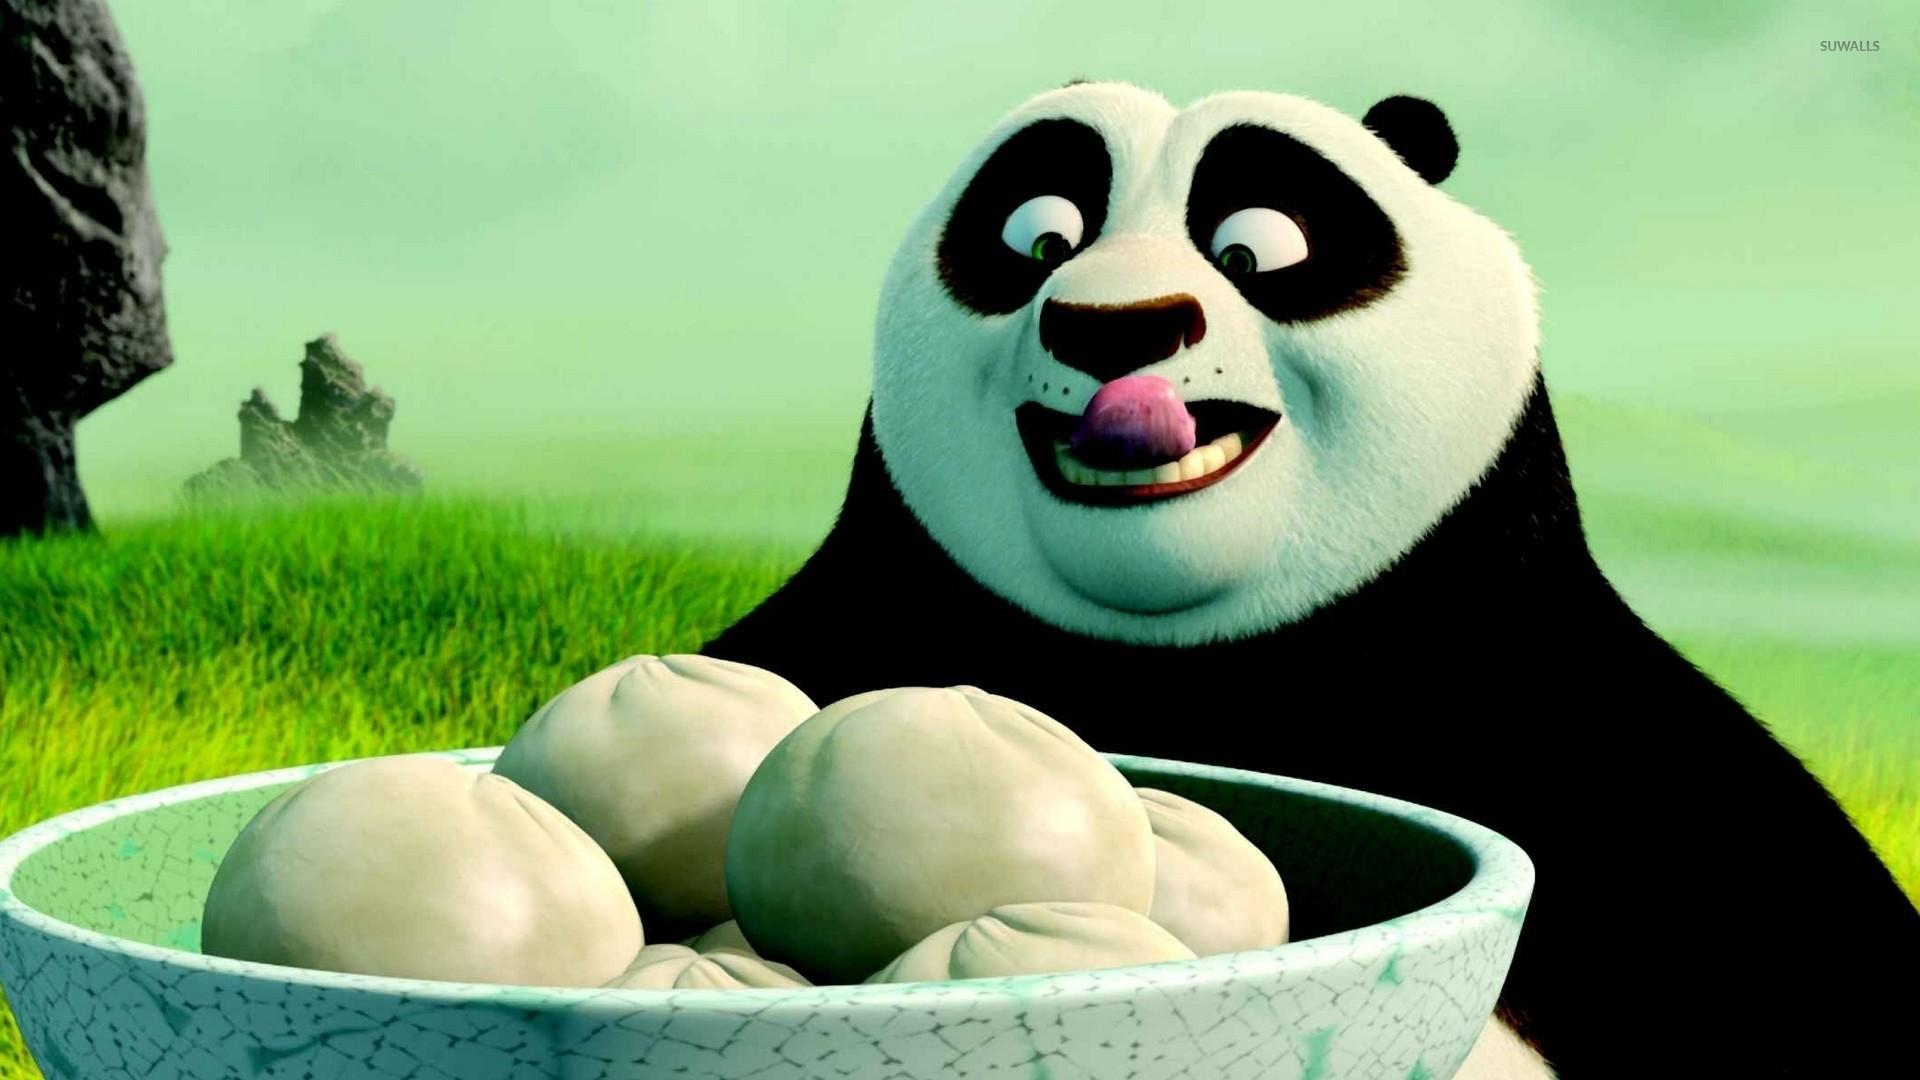 Po having dumplings – Kung Fu Panda wallpaper